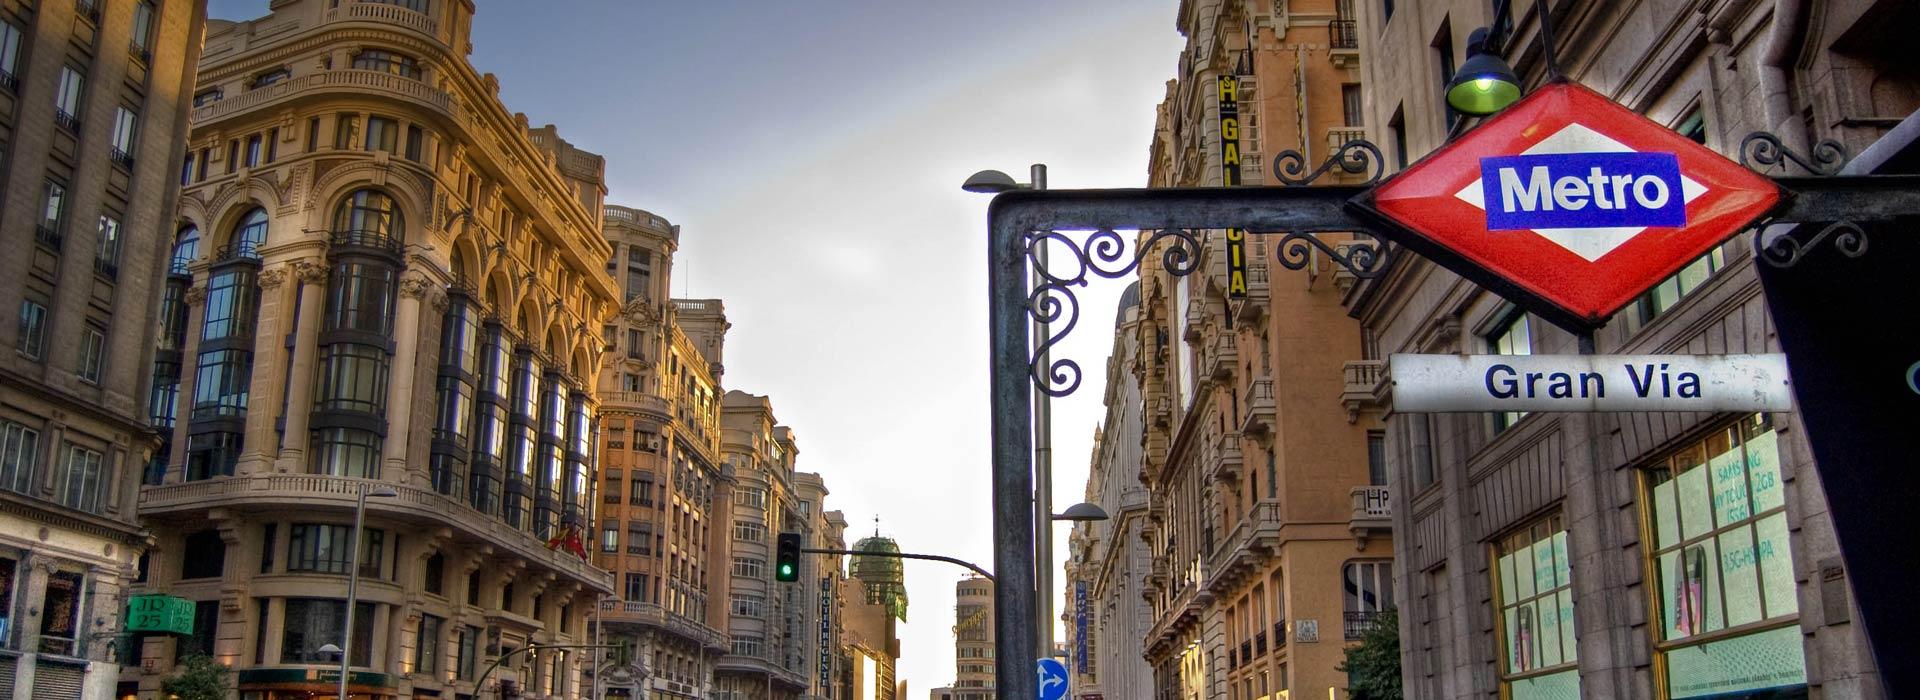 Madrid.Gran Vía